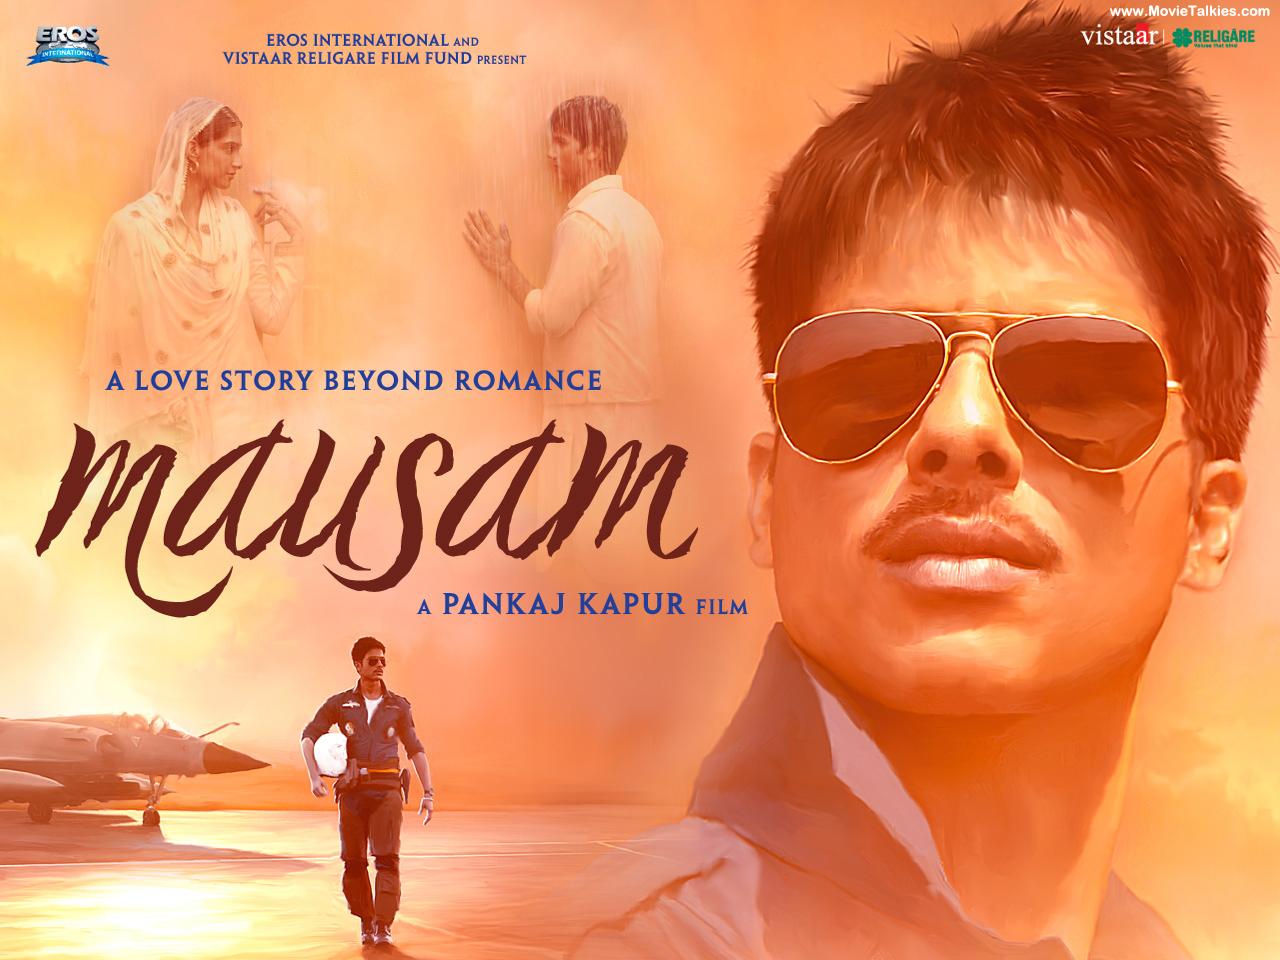 Quality Pataal Bhairavi Full Movie